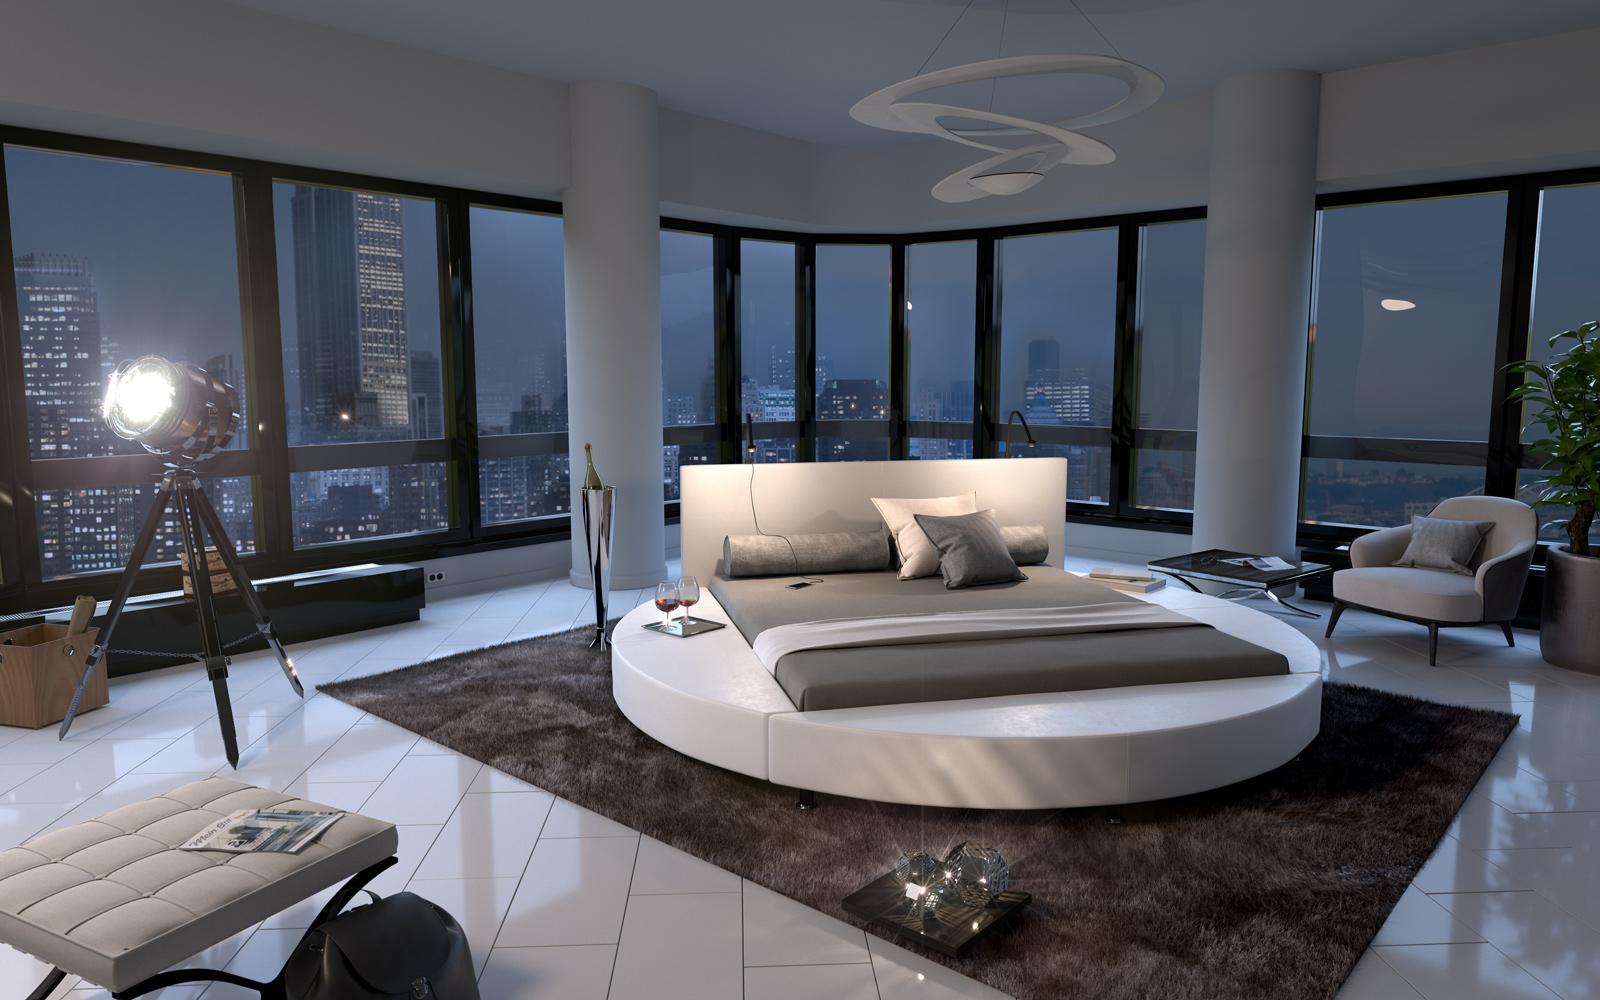 sam rundbett hotelbett 140 x 200 cm wei gaston. Black Bedroom Furniture Sets. Home Design Ideas